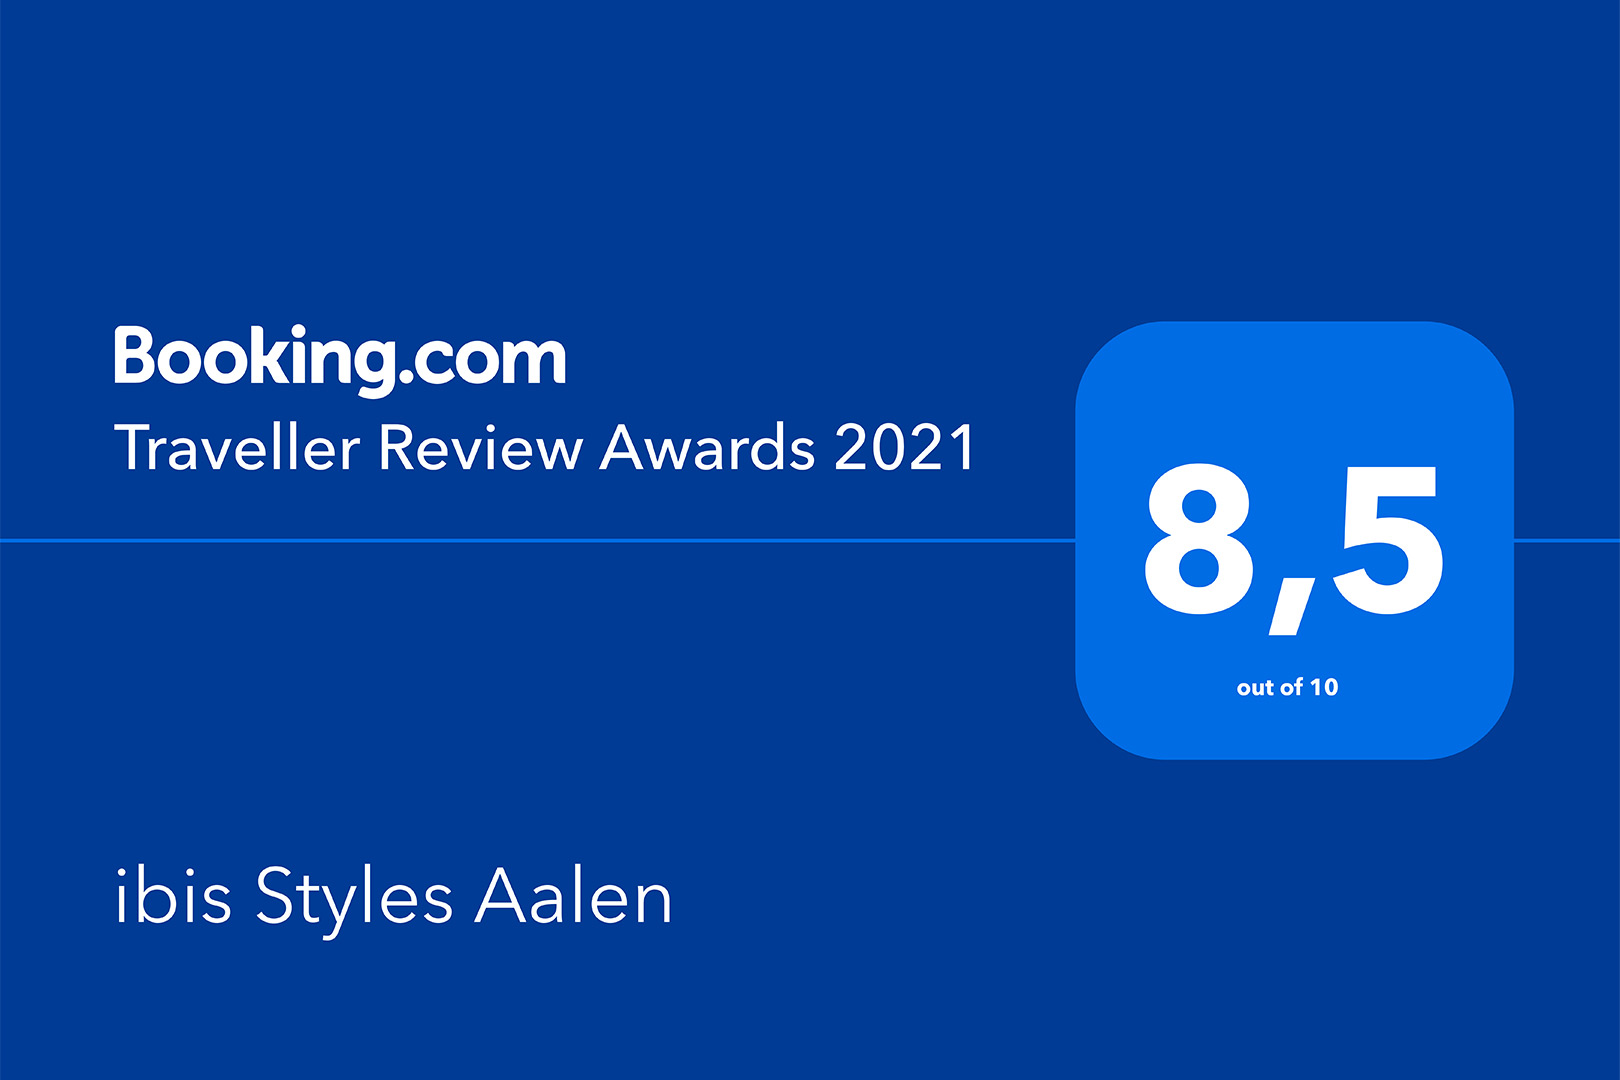 ibis Styles Aalen - Traveller Review Award 2021